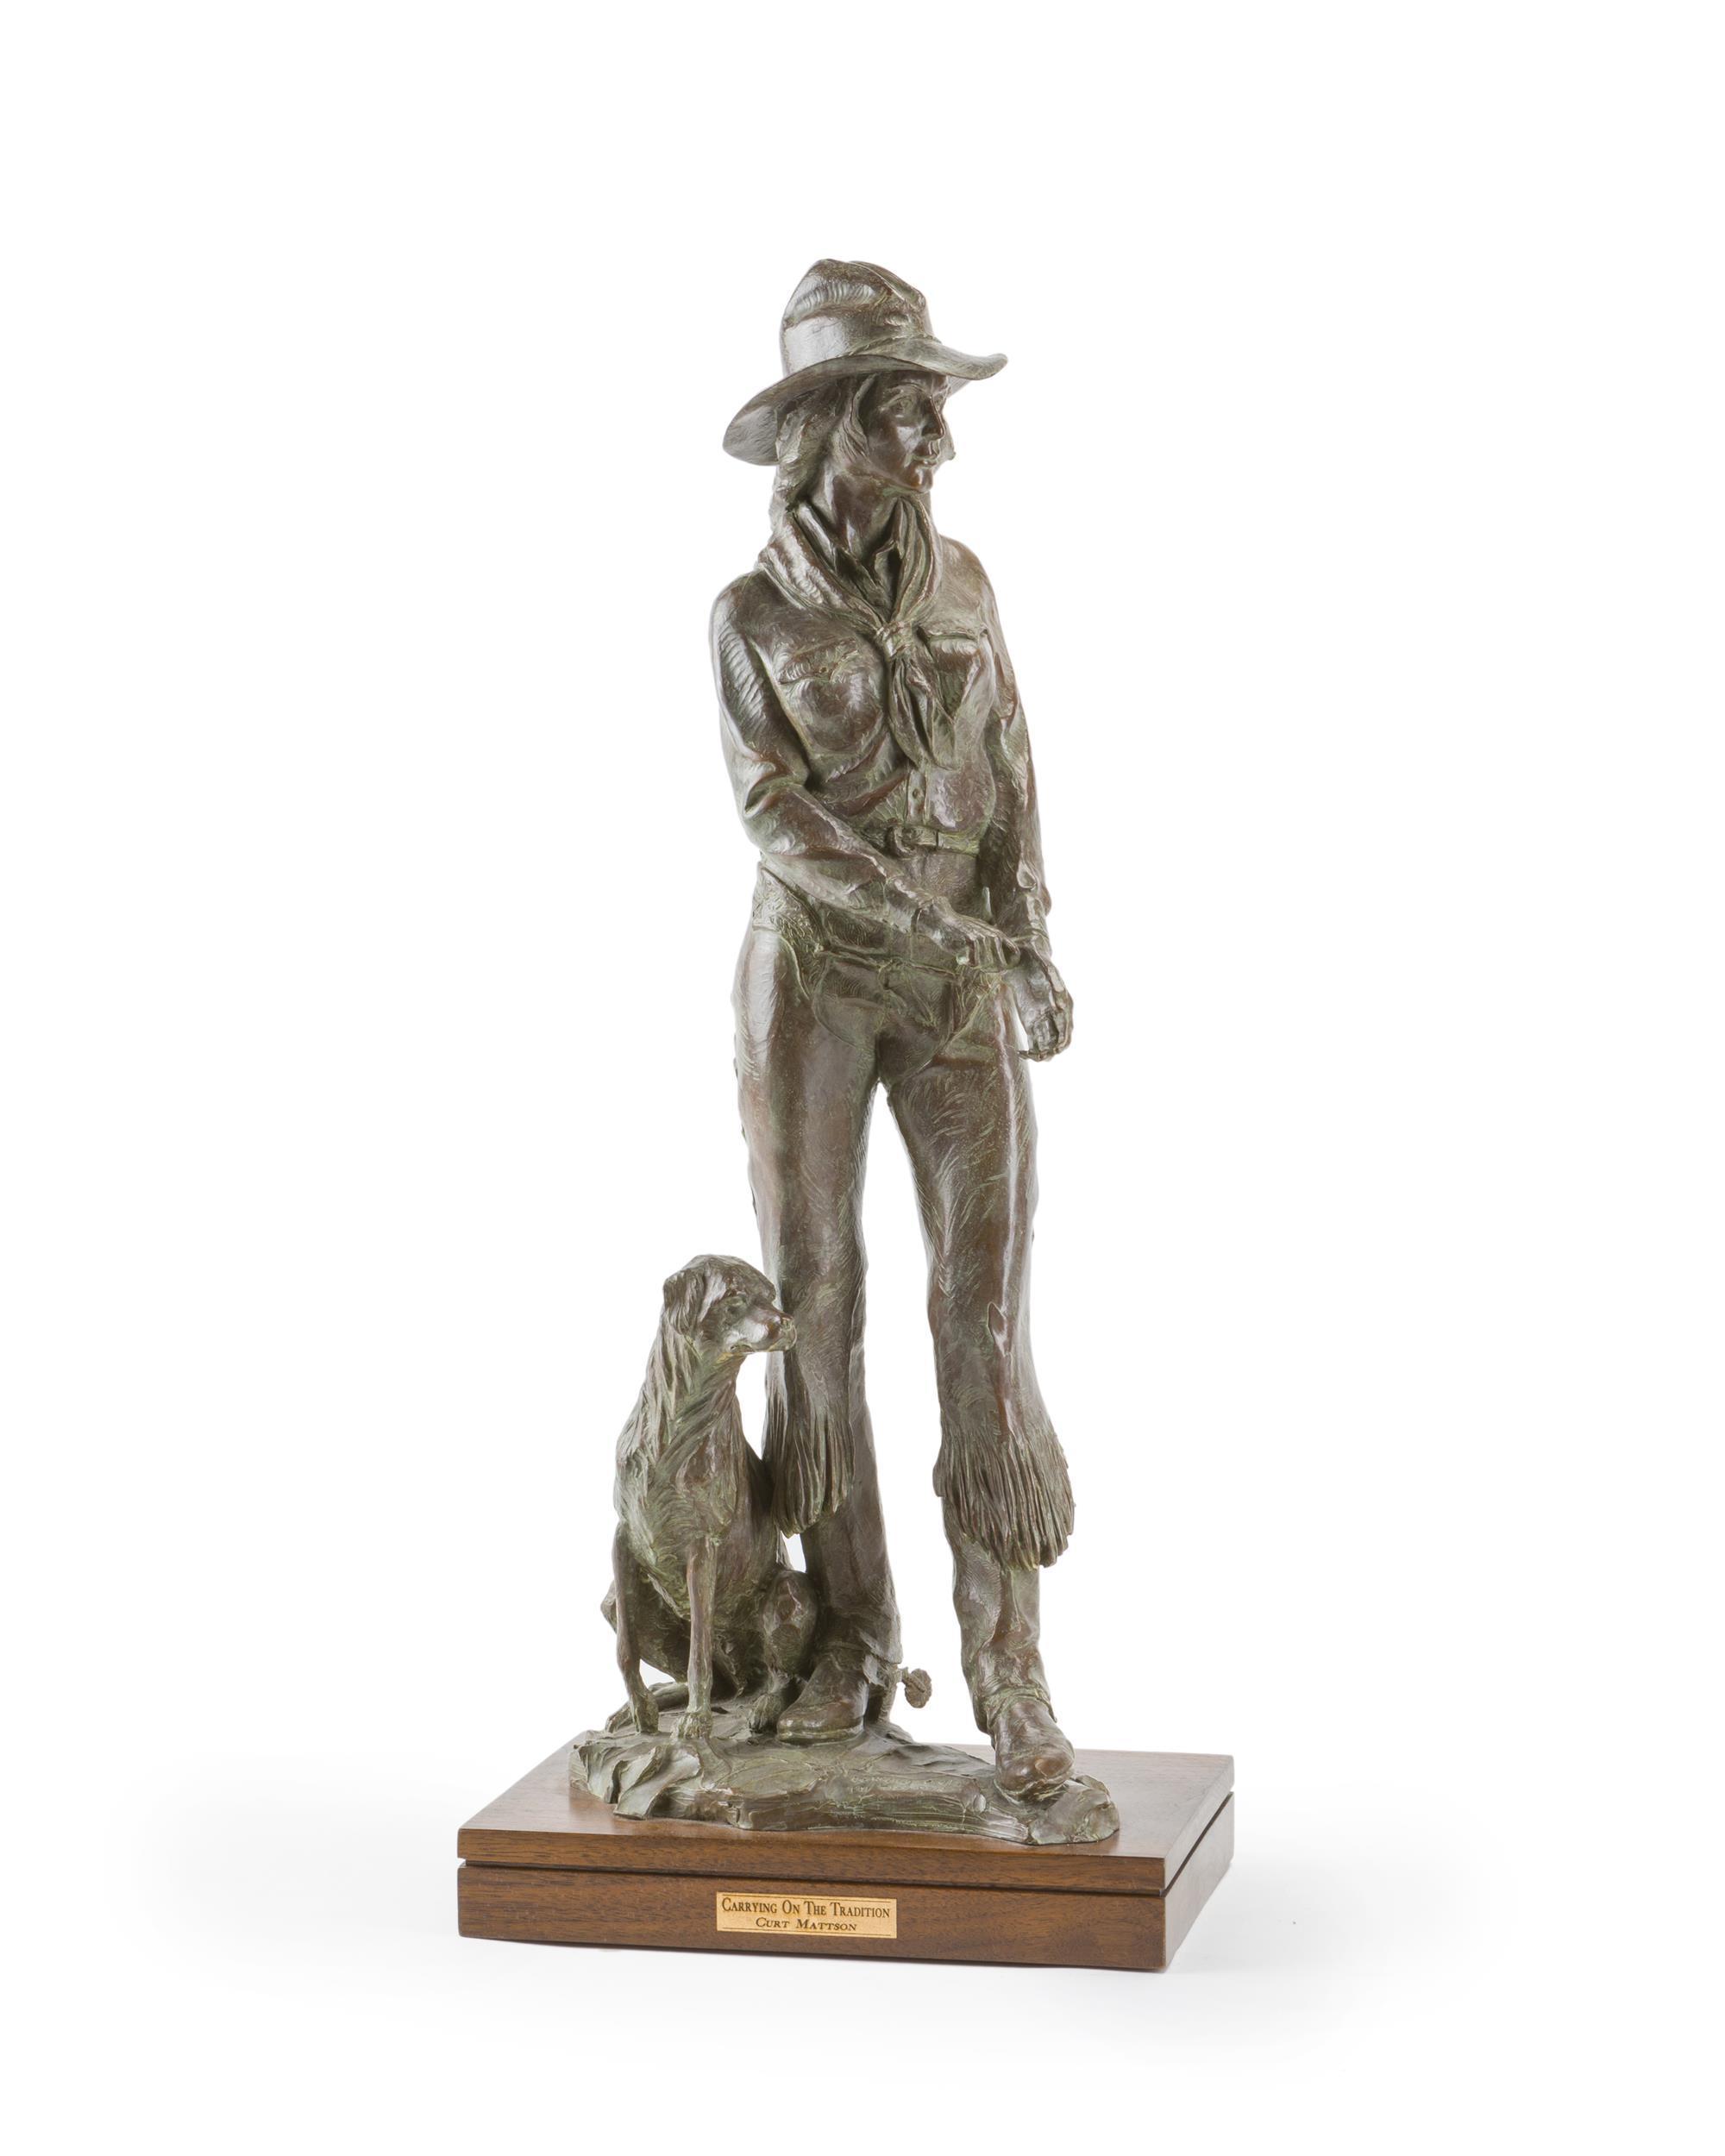 "Curt Mattson, (b. 1956 Arizona), ""Carrying on the Tradition,"" 1992, Patinated bronze on rotating wood plinth, 25.25"" H x 9"" W x 7"" D"